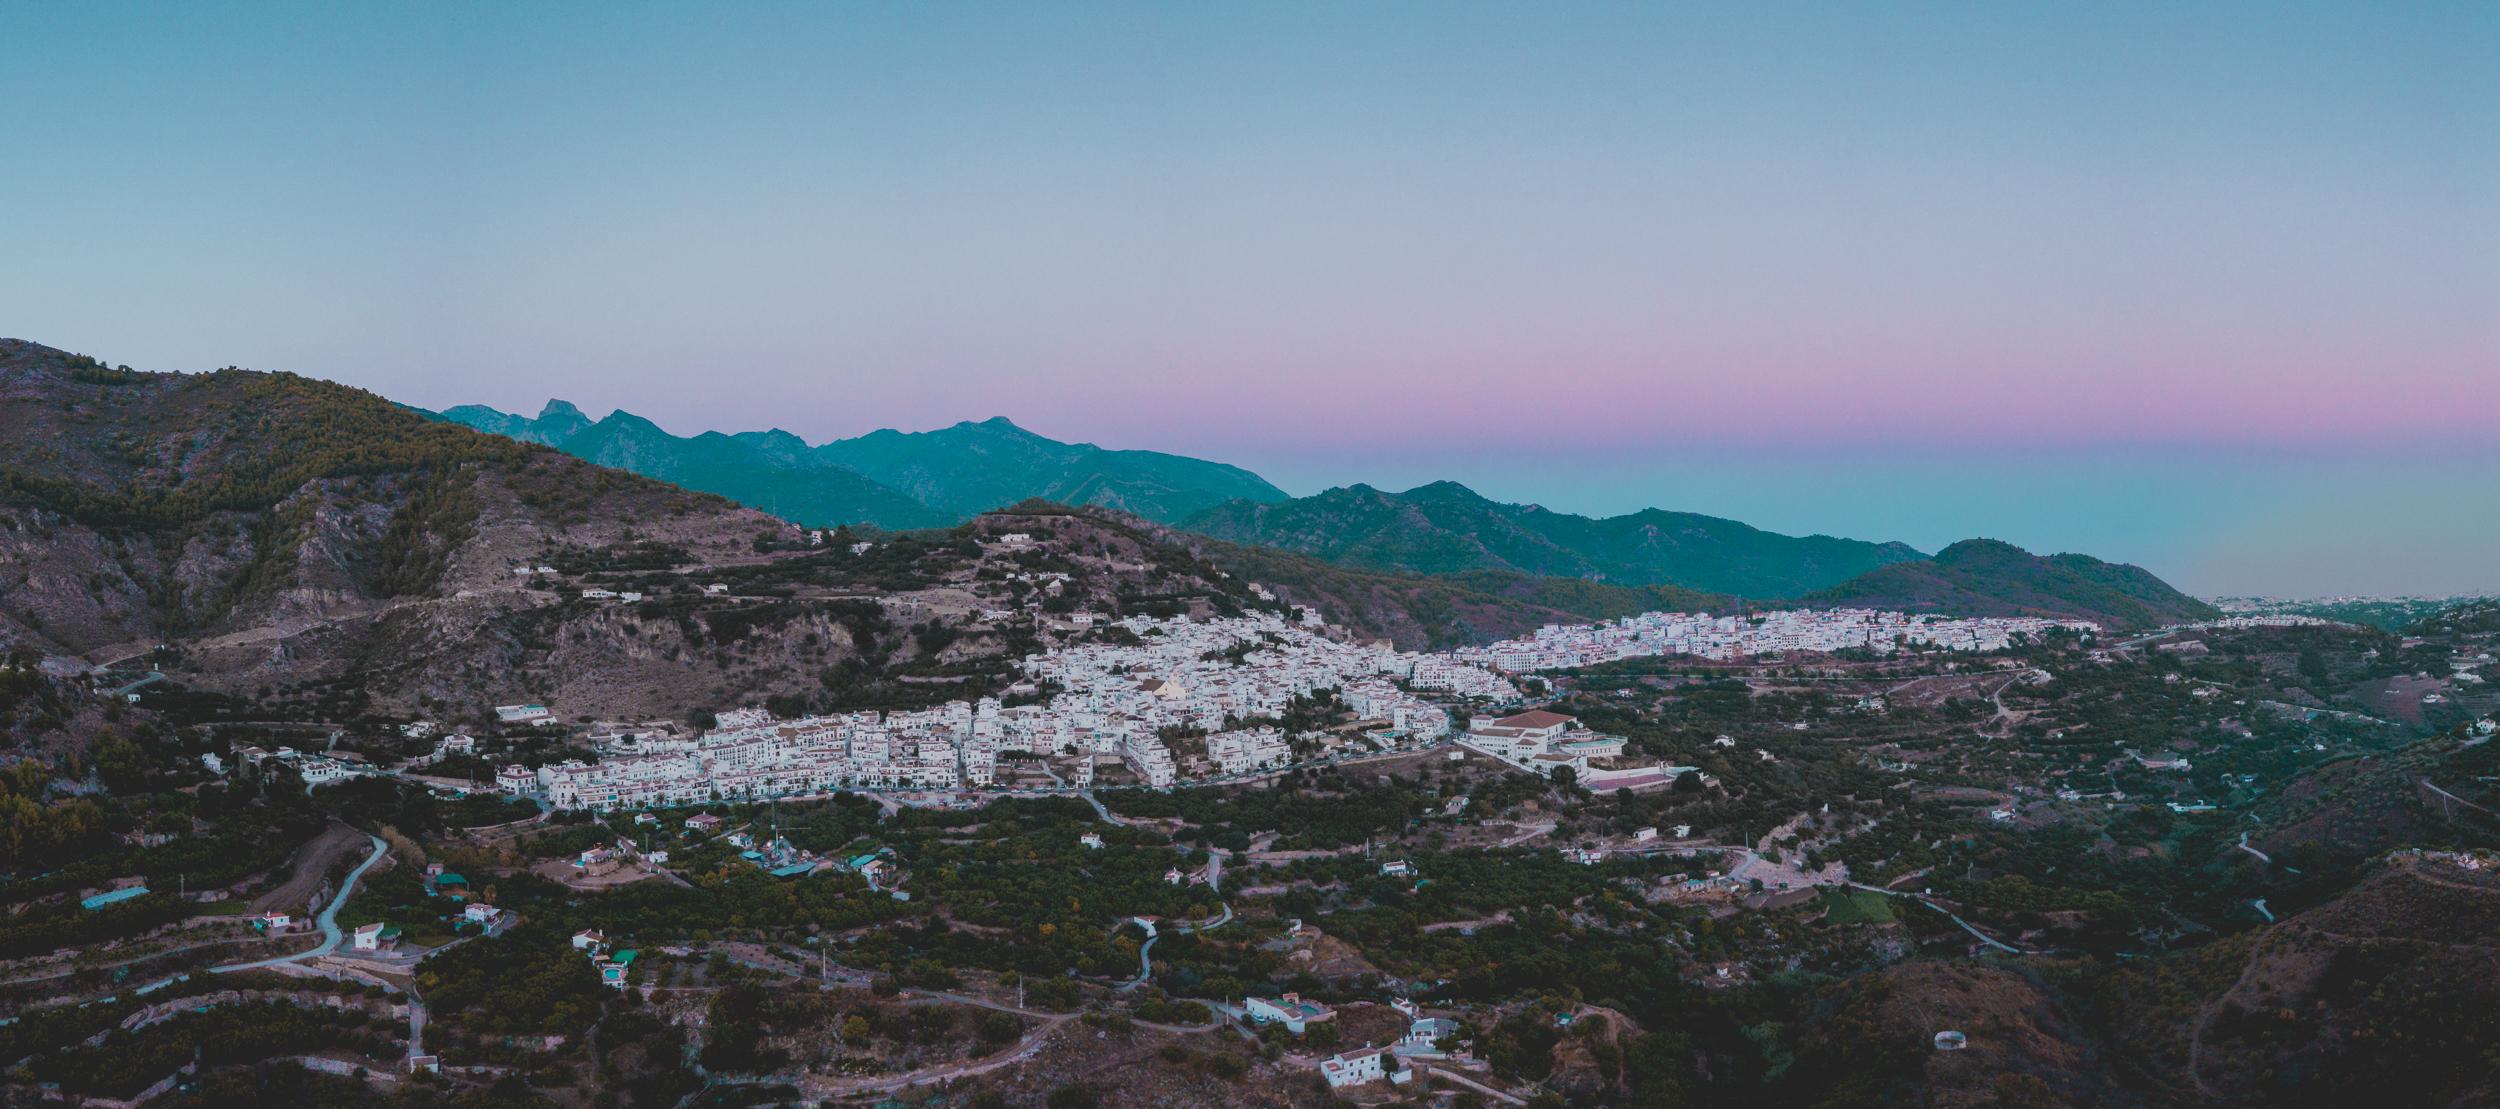 Mavic Pro aerial panorama of Frigiliana, Spain.